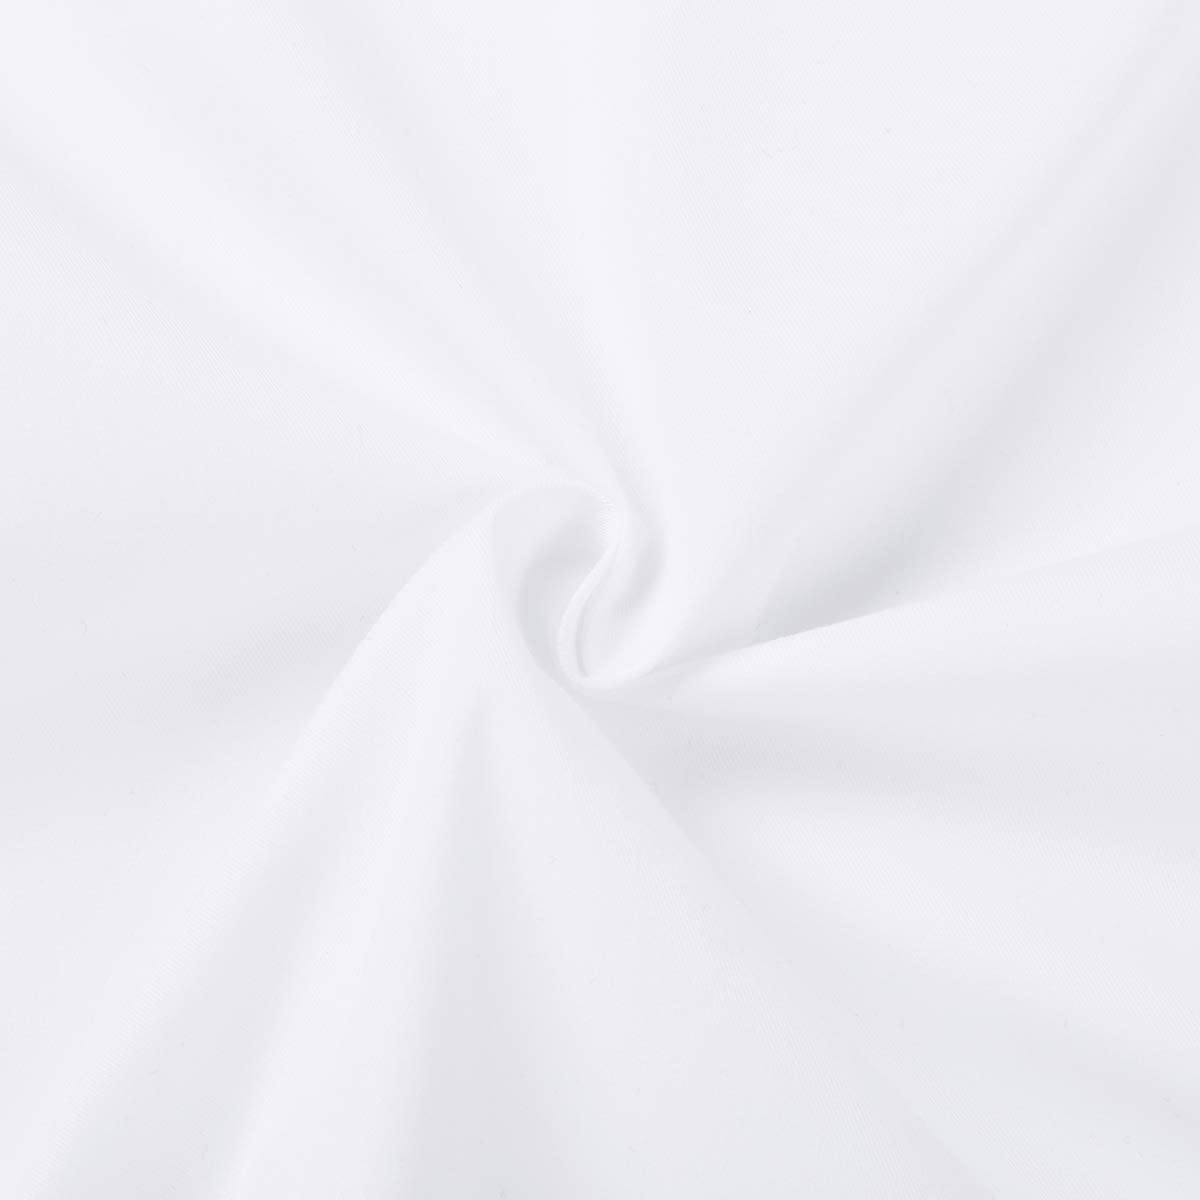 YiZYiF Donna Uniforme Scolastica Giapponese Costume Marinara Camicia da Marina a Manica Lunga//Gonna Pieghe Set da Studentessa Cosplay Costume Carnevale Natale Festa